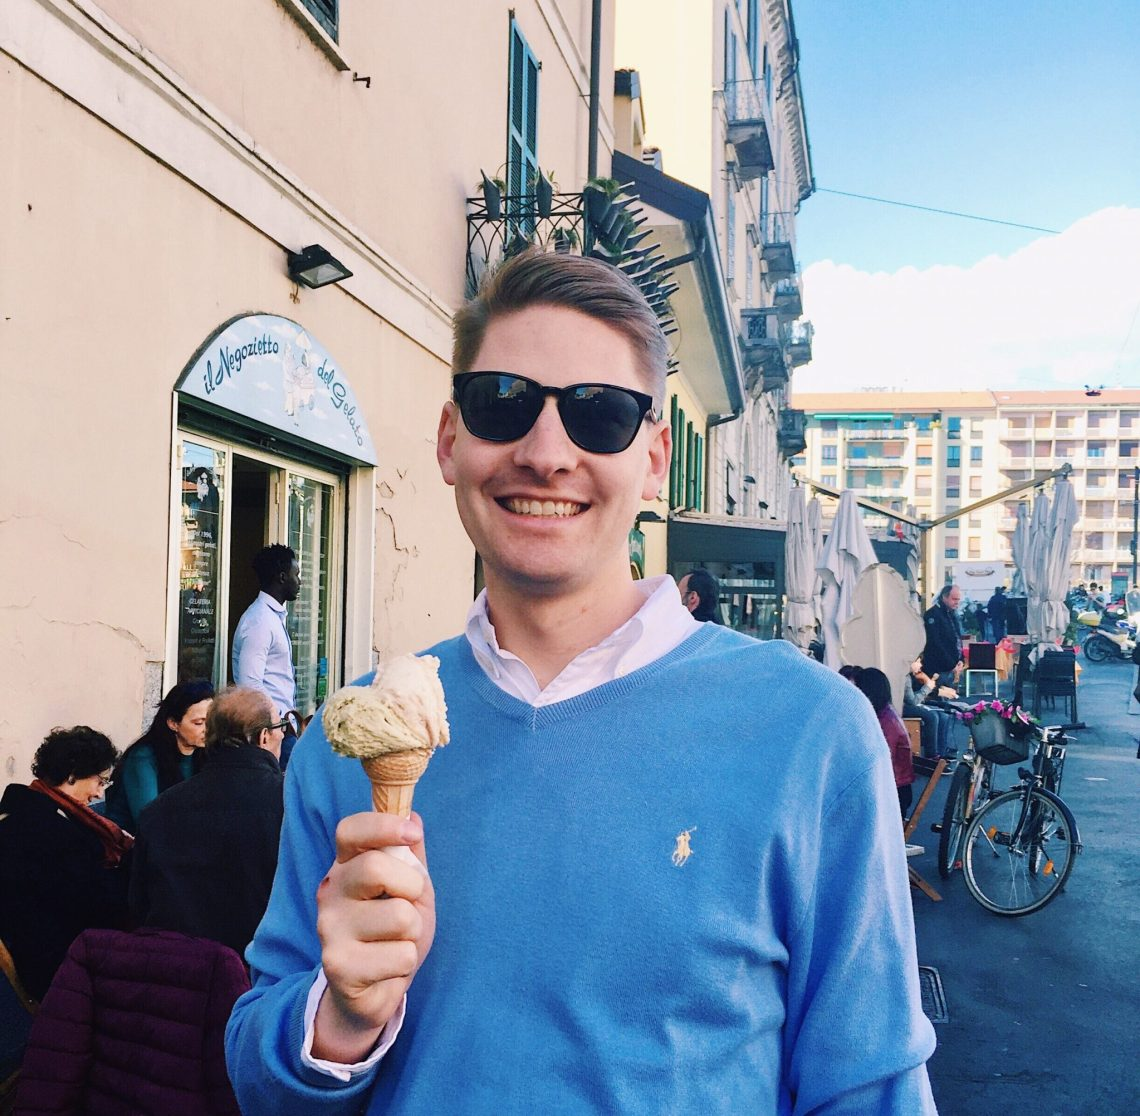 gelato in Milan